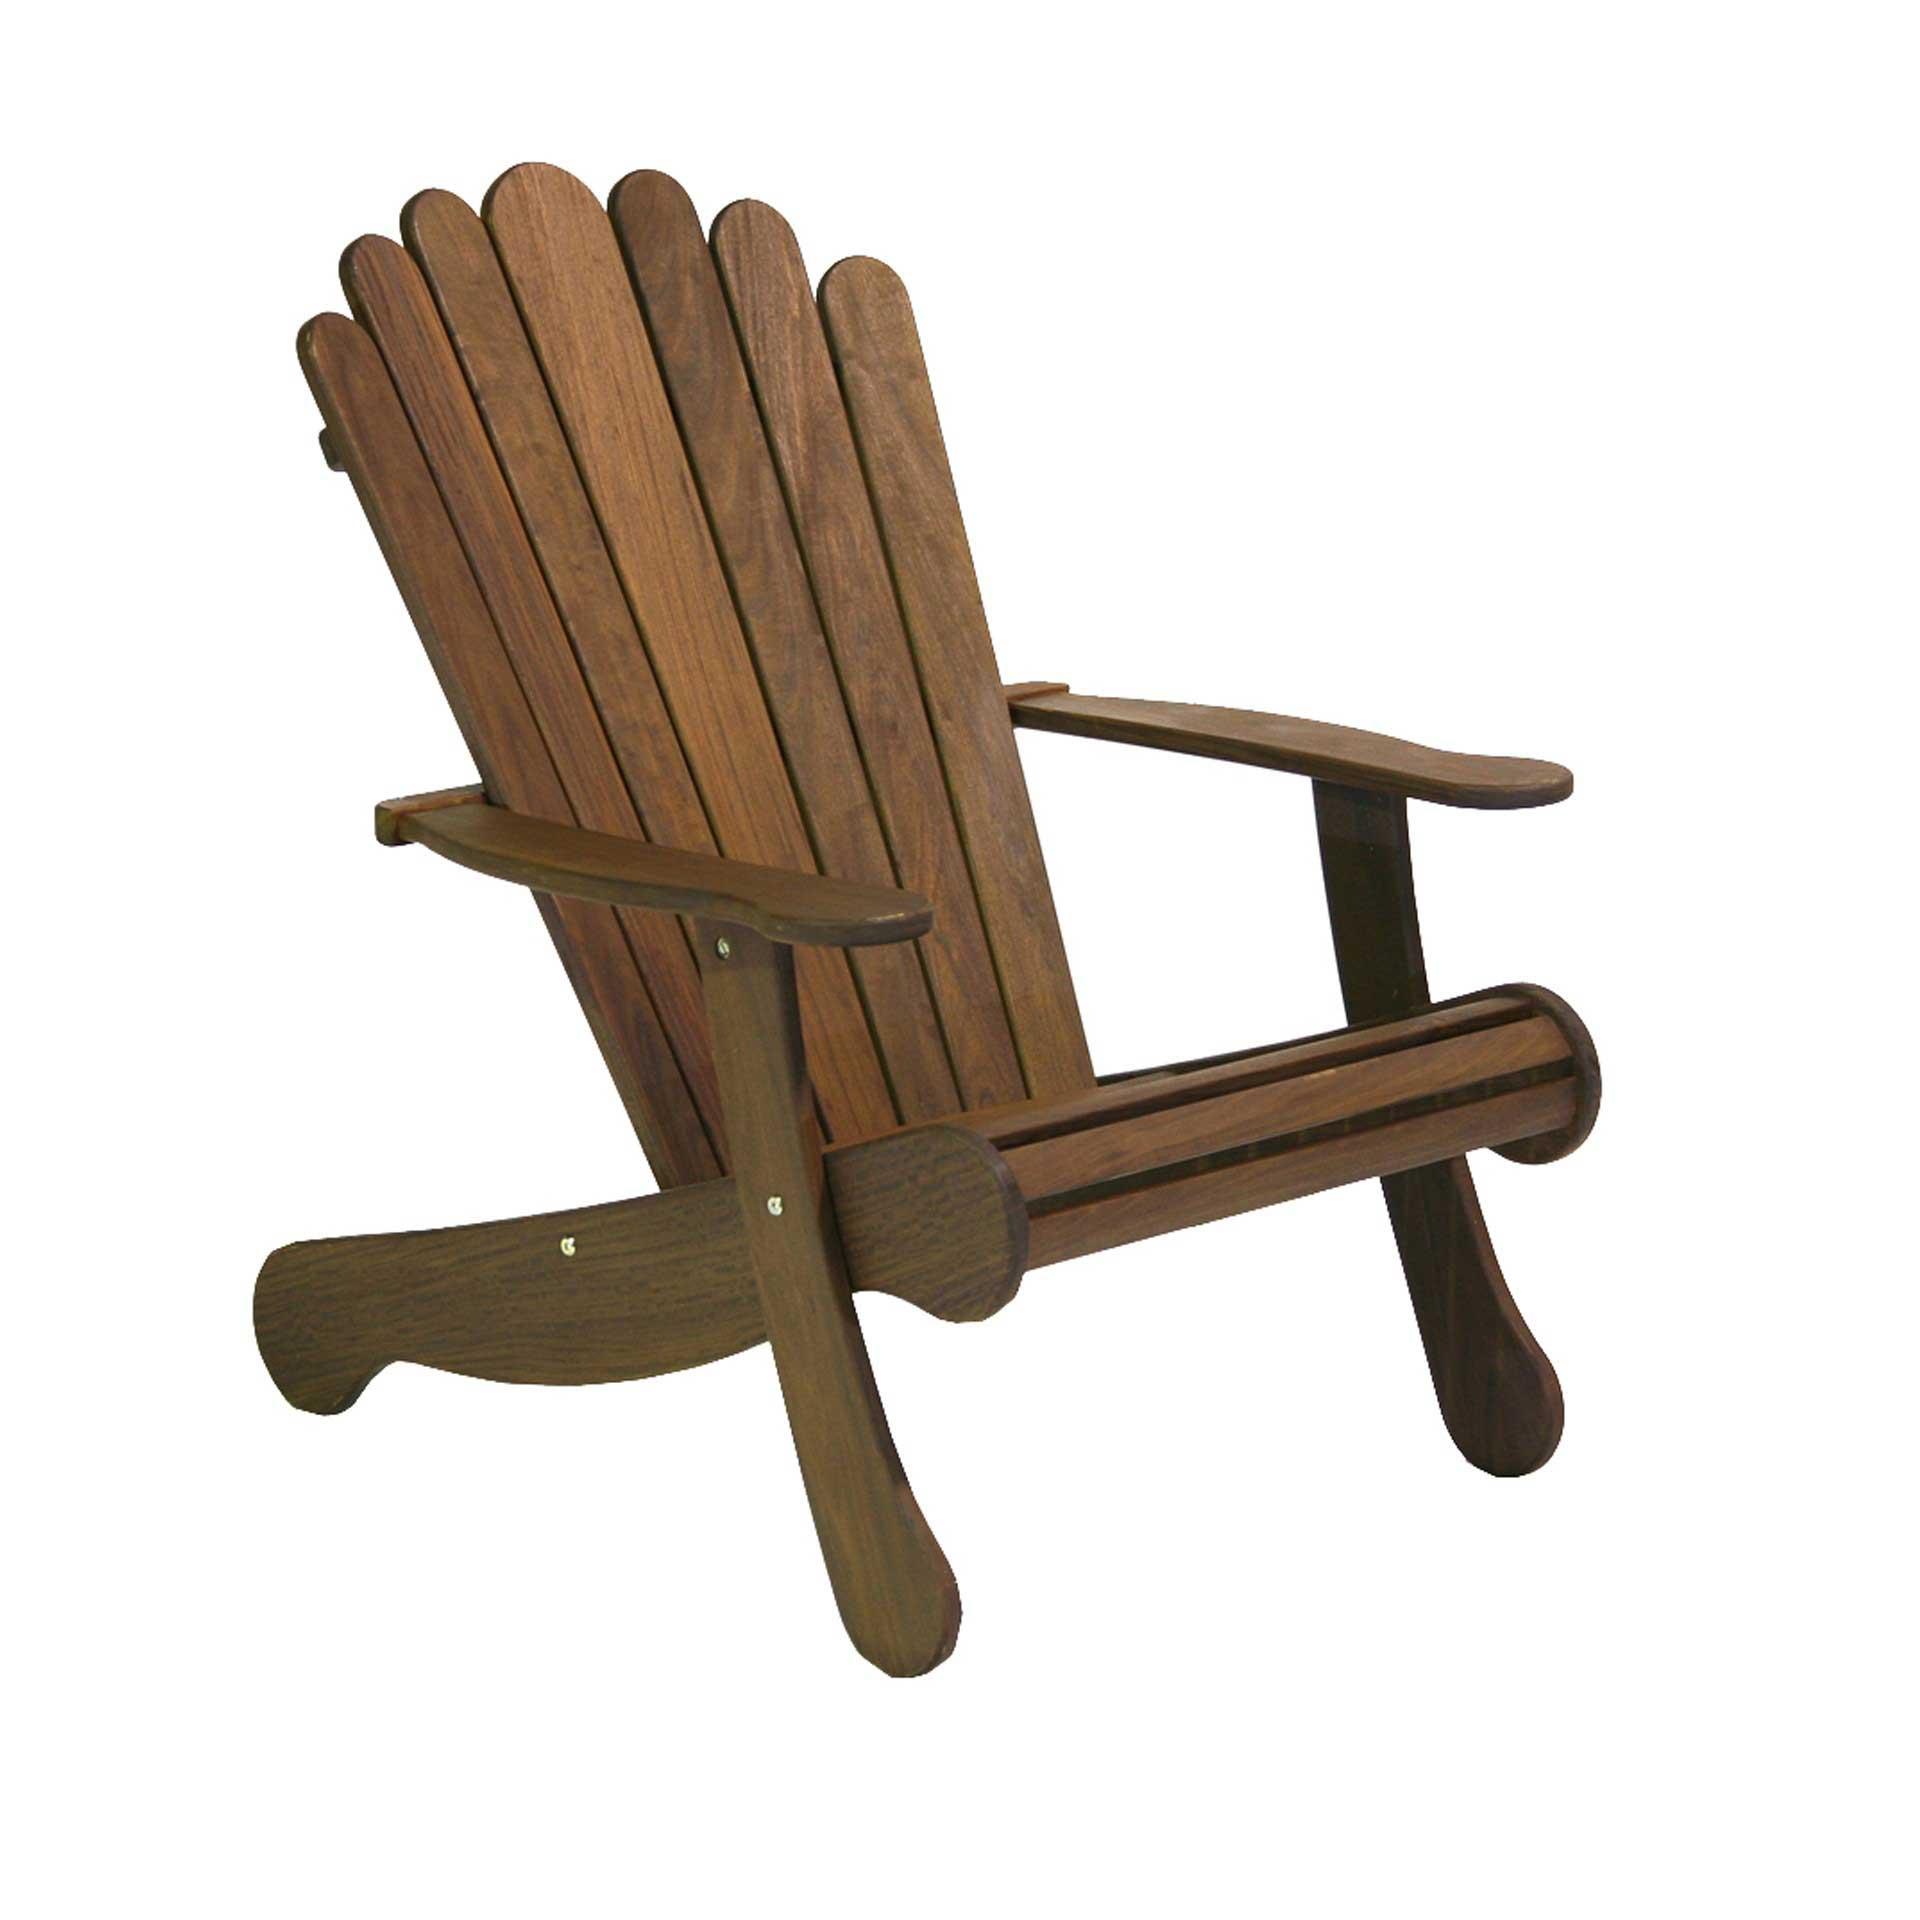 Adirondack chairs outdoor furniture sunnyland outdoor for Outdoor furniture dallas